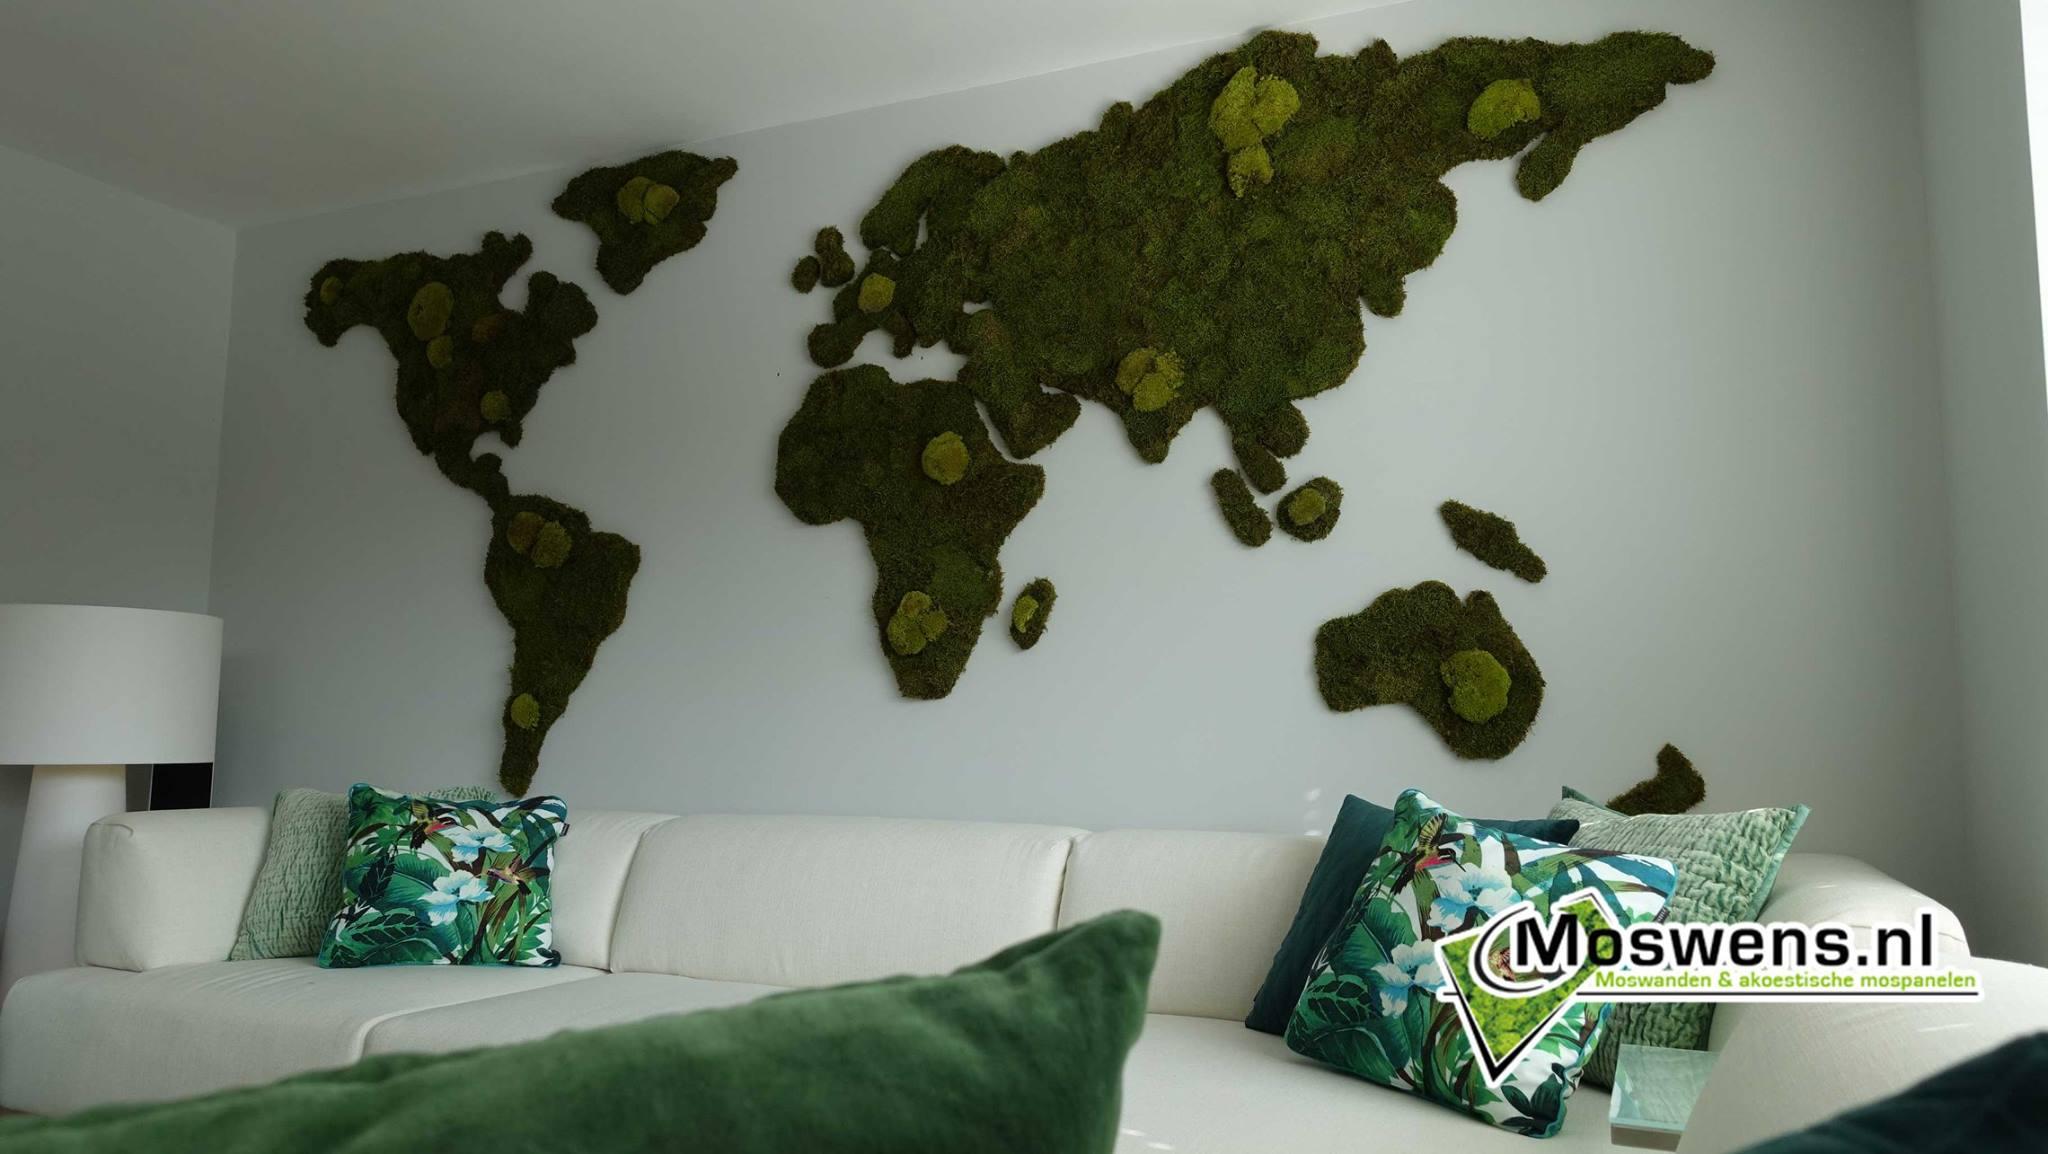 Groene wereldkaart aan de muur van Moswens #interieur #woonideeen #groen